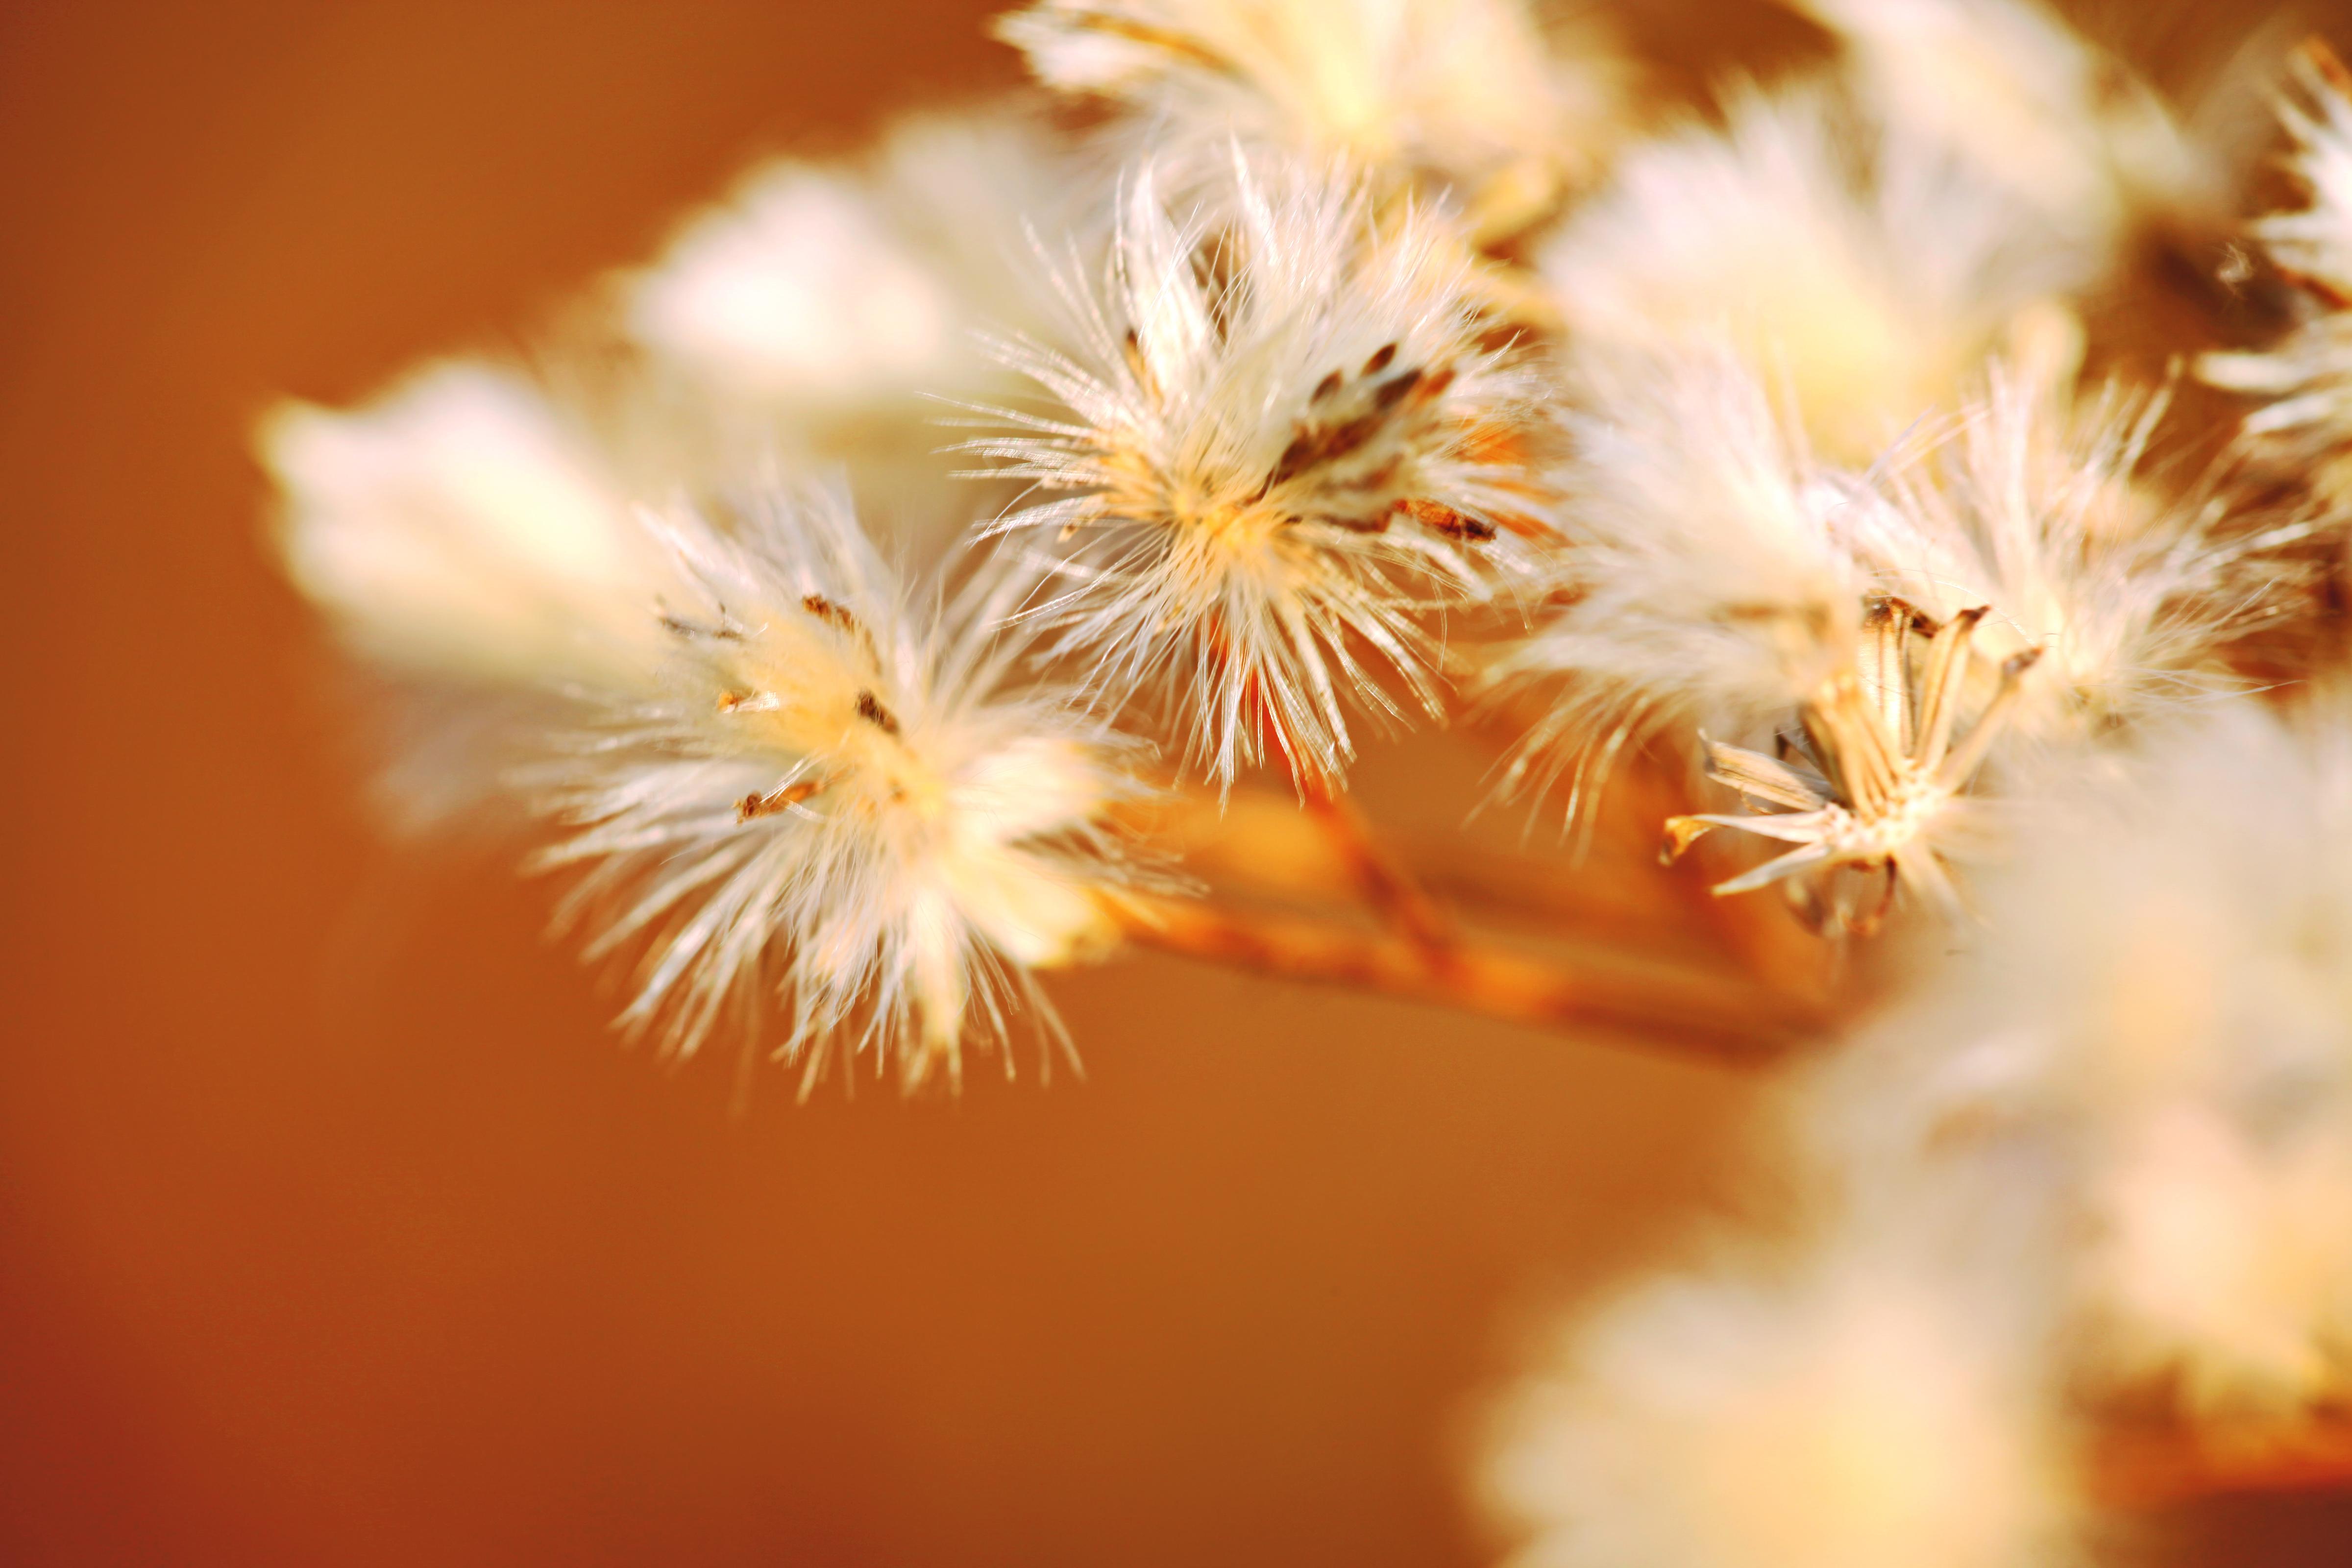 Nature background, Flower, Nature, Orange, Plant, HQ Photo